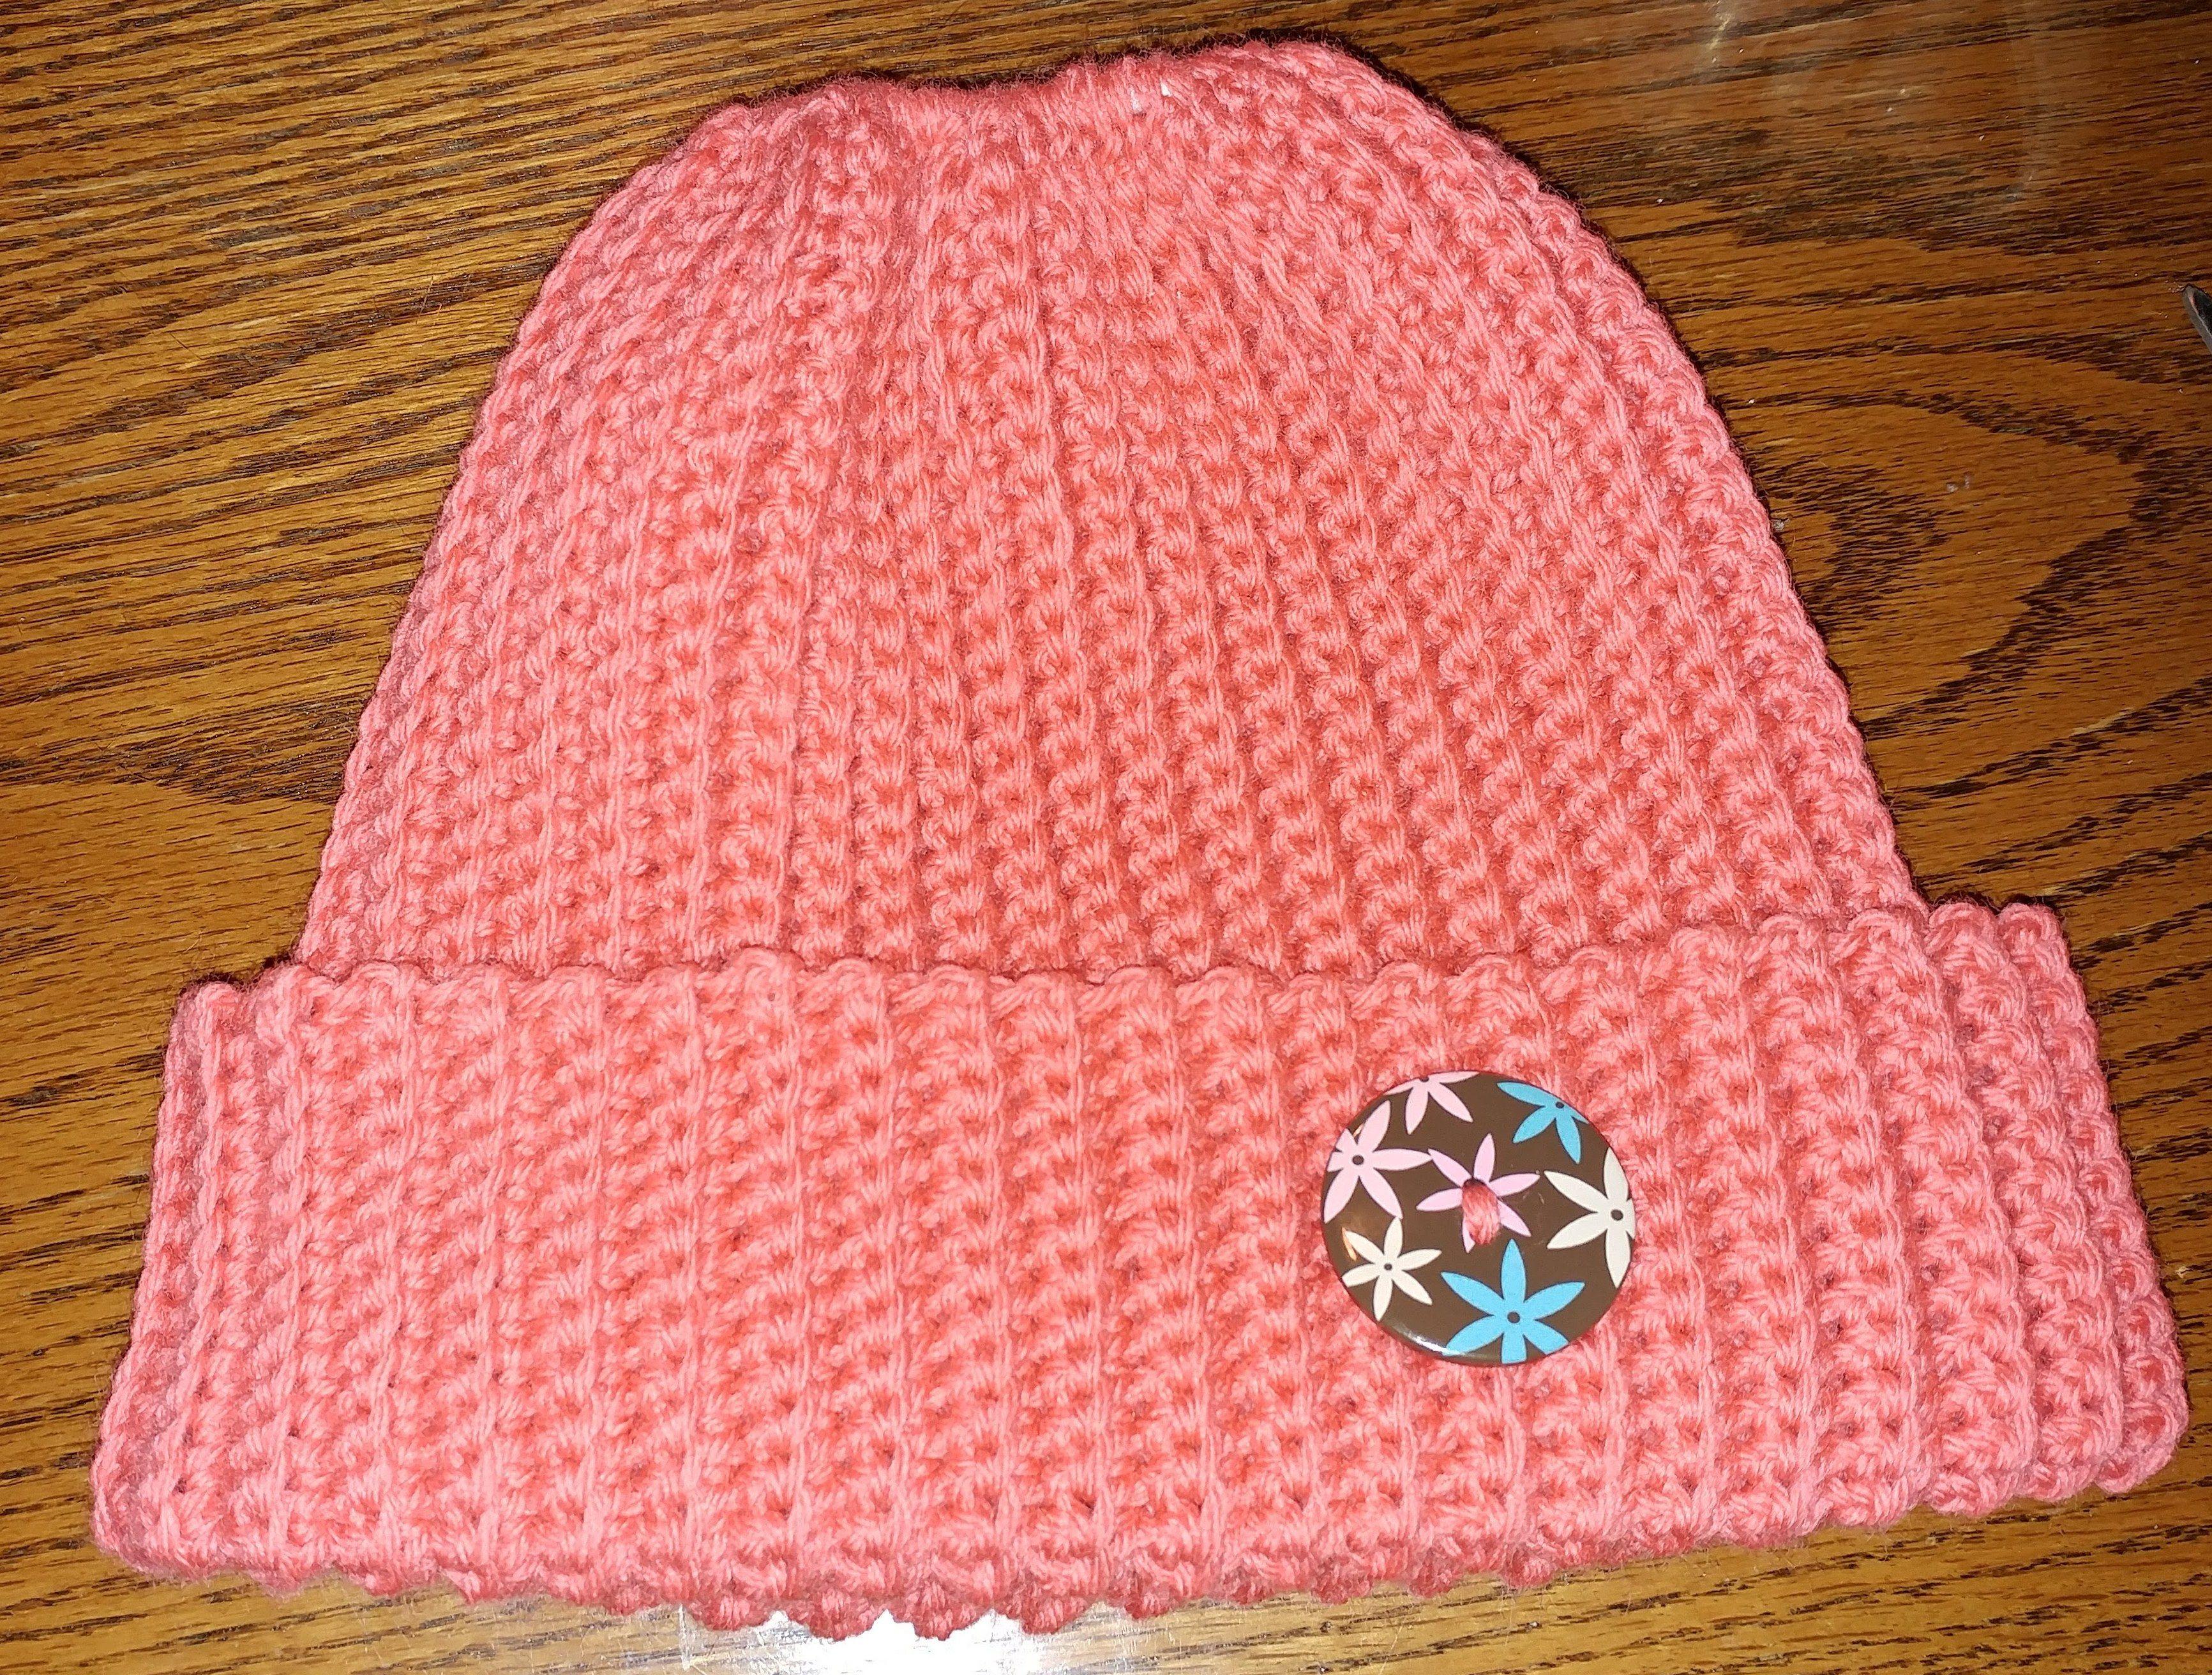 63771bd6a Crocheted holey hat | Knit/Crochet - My Knits | Knit Crochet ...